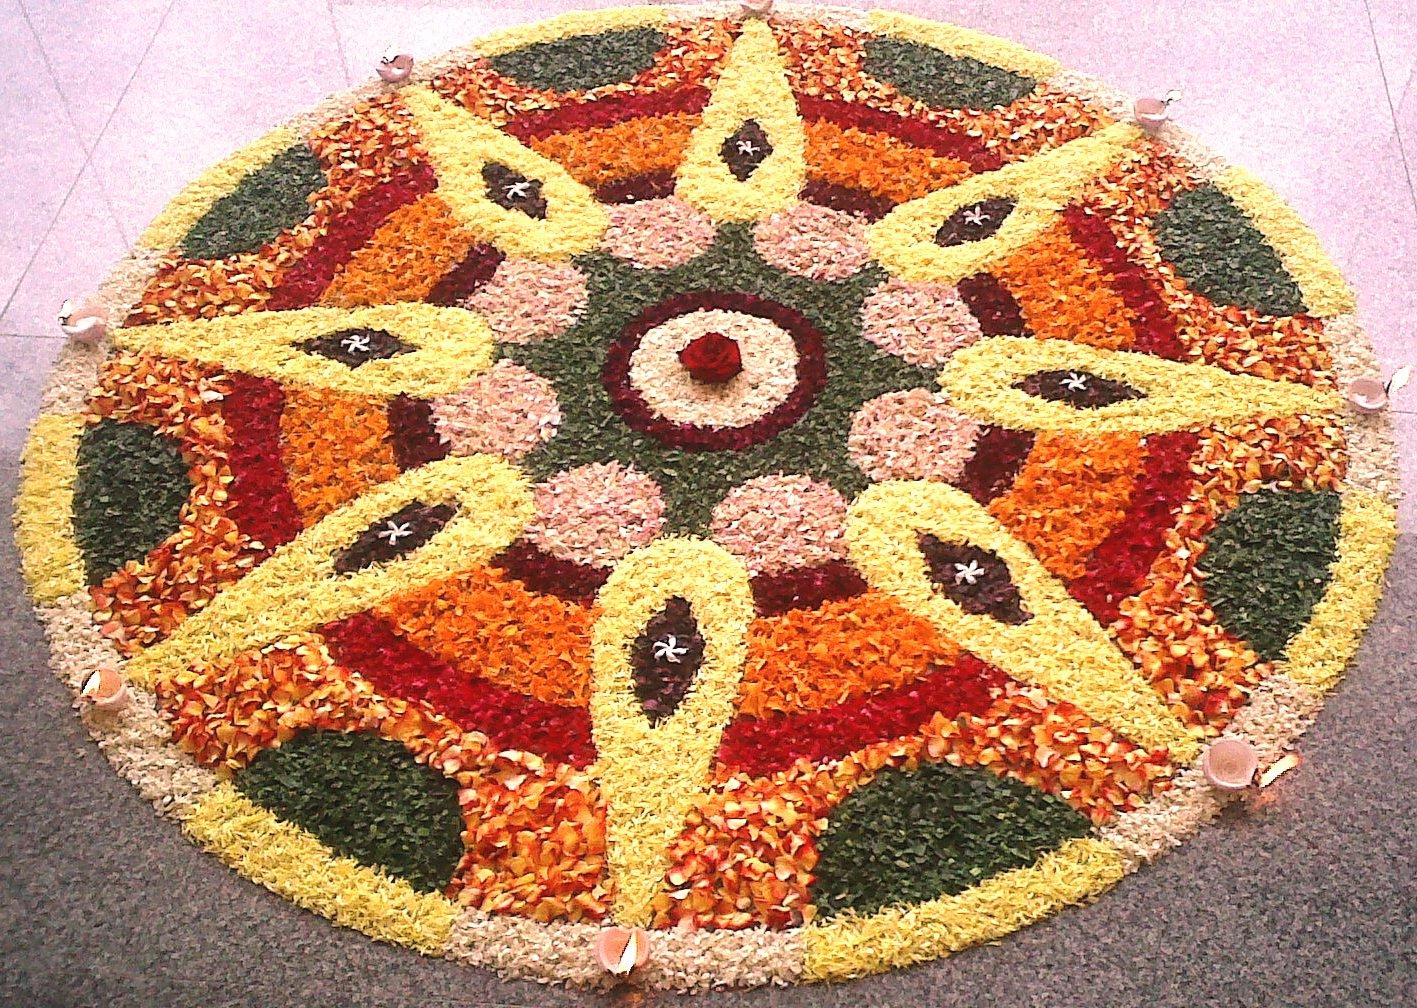 Sawdust Carpets Coat Guatemalan Streets Nat Geo